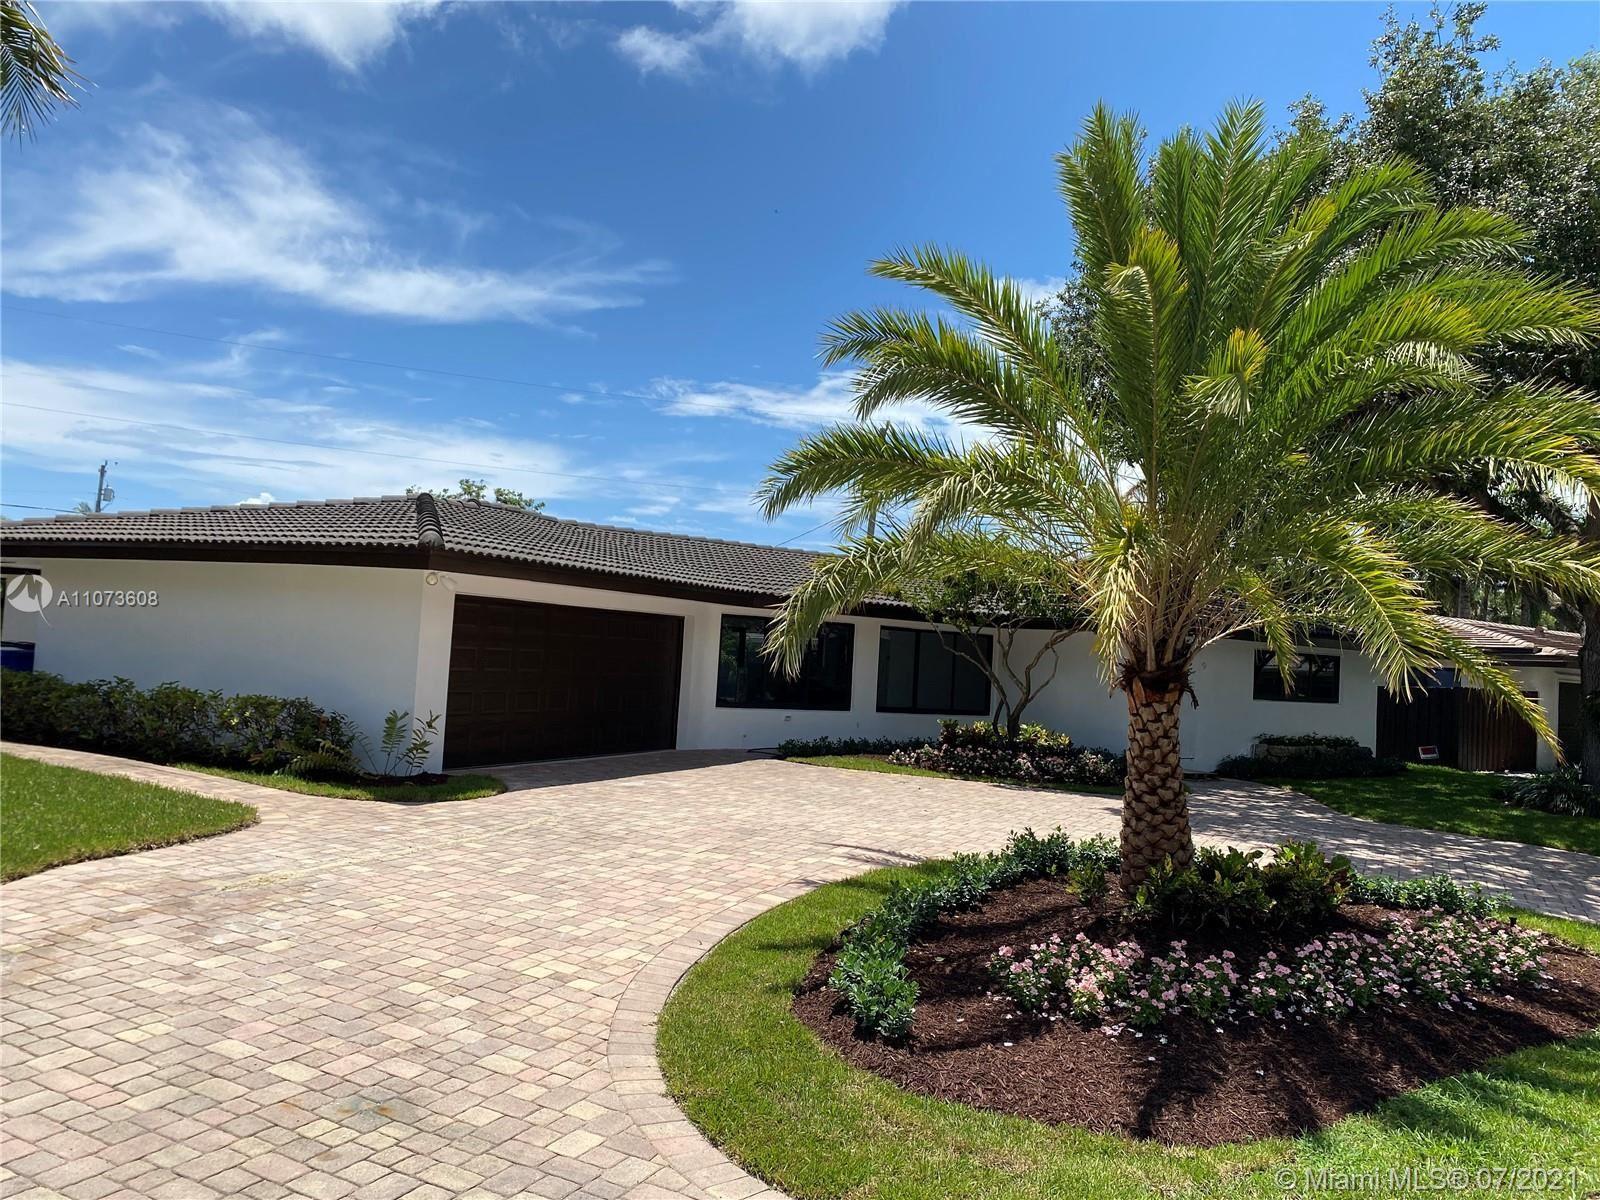 4500 NE 22nd Rd, Fort Lauderdale, FL 33308 - #: A11073608